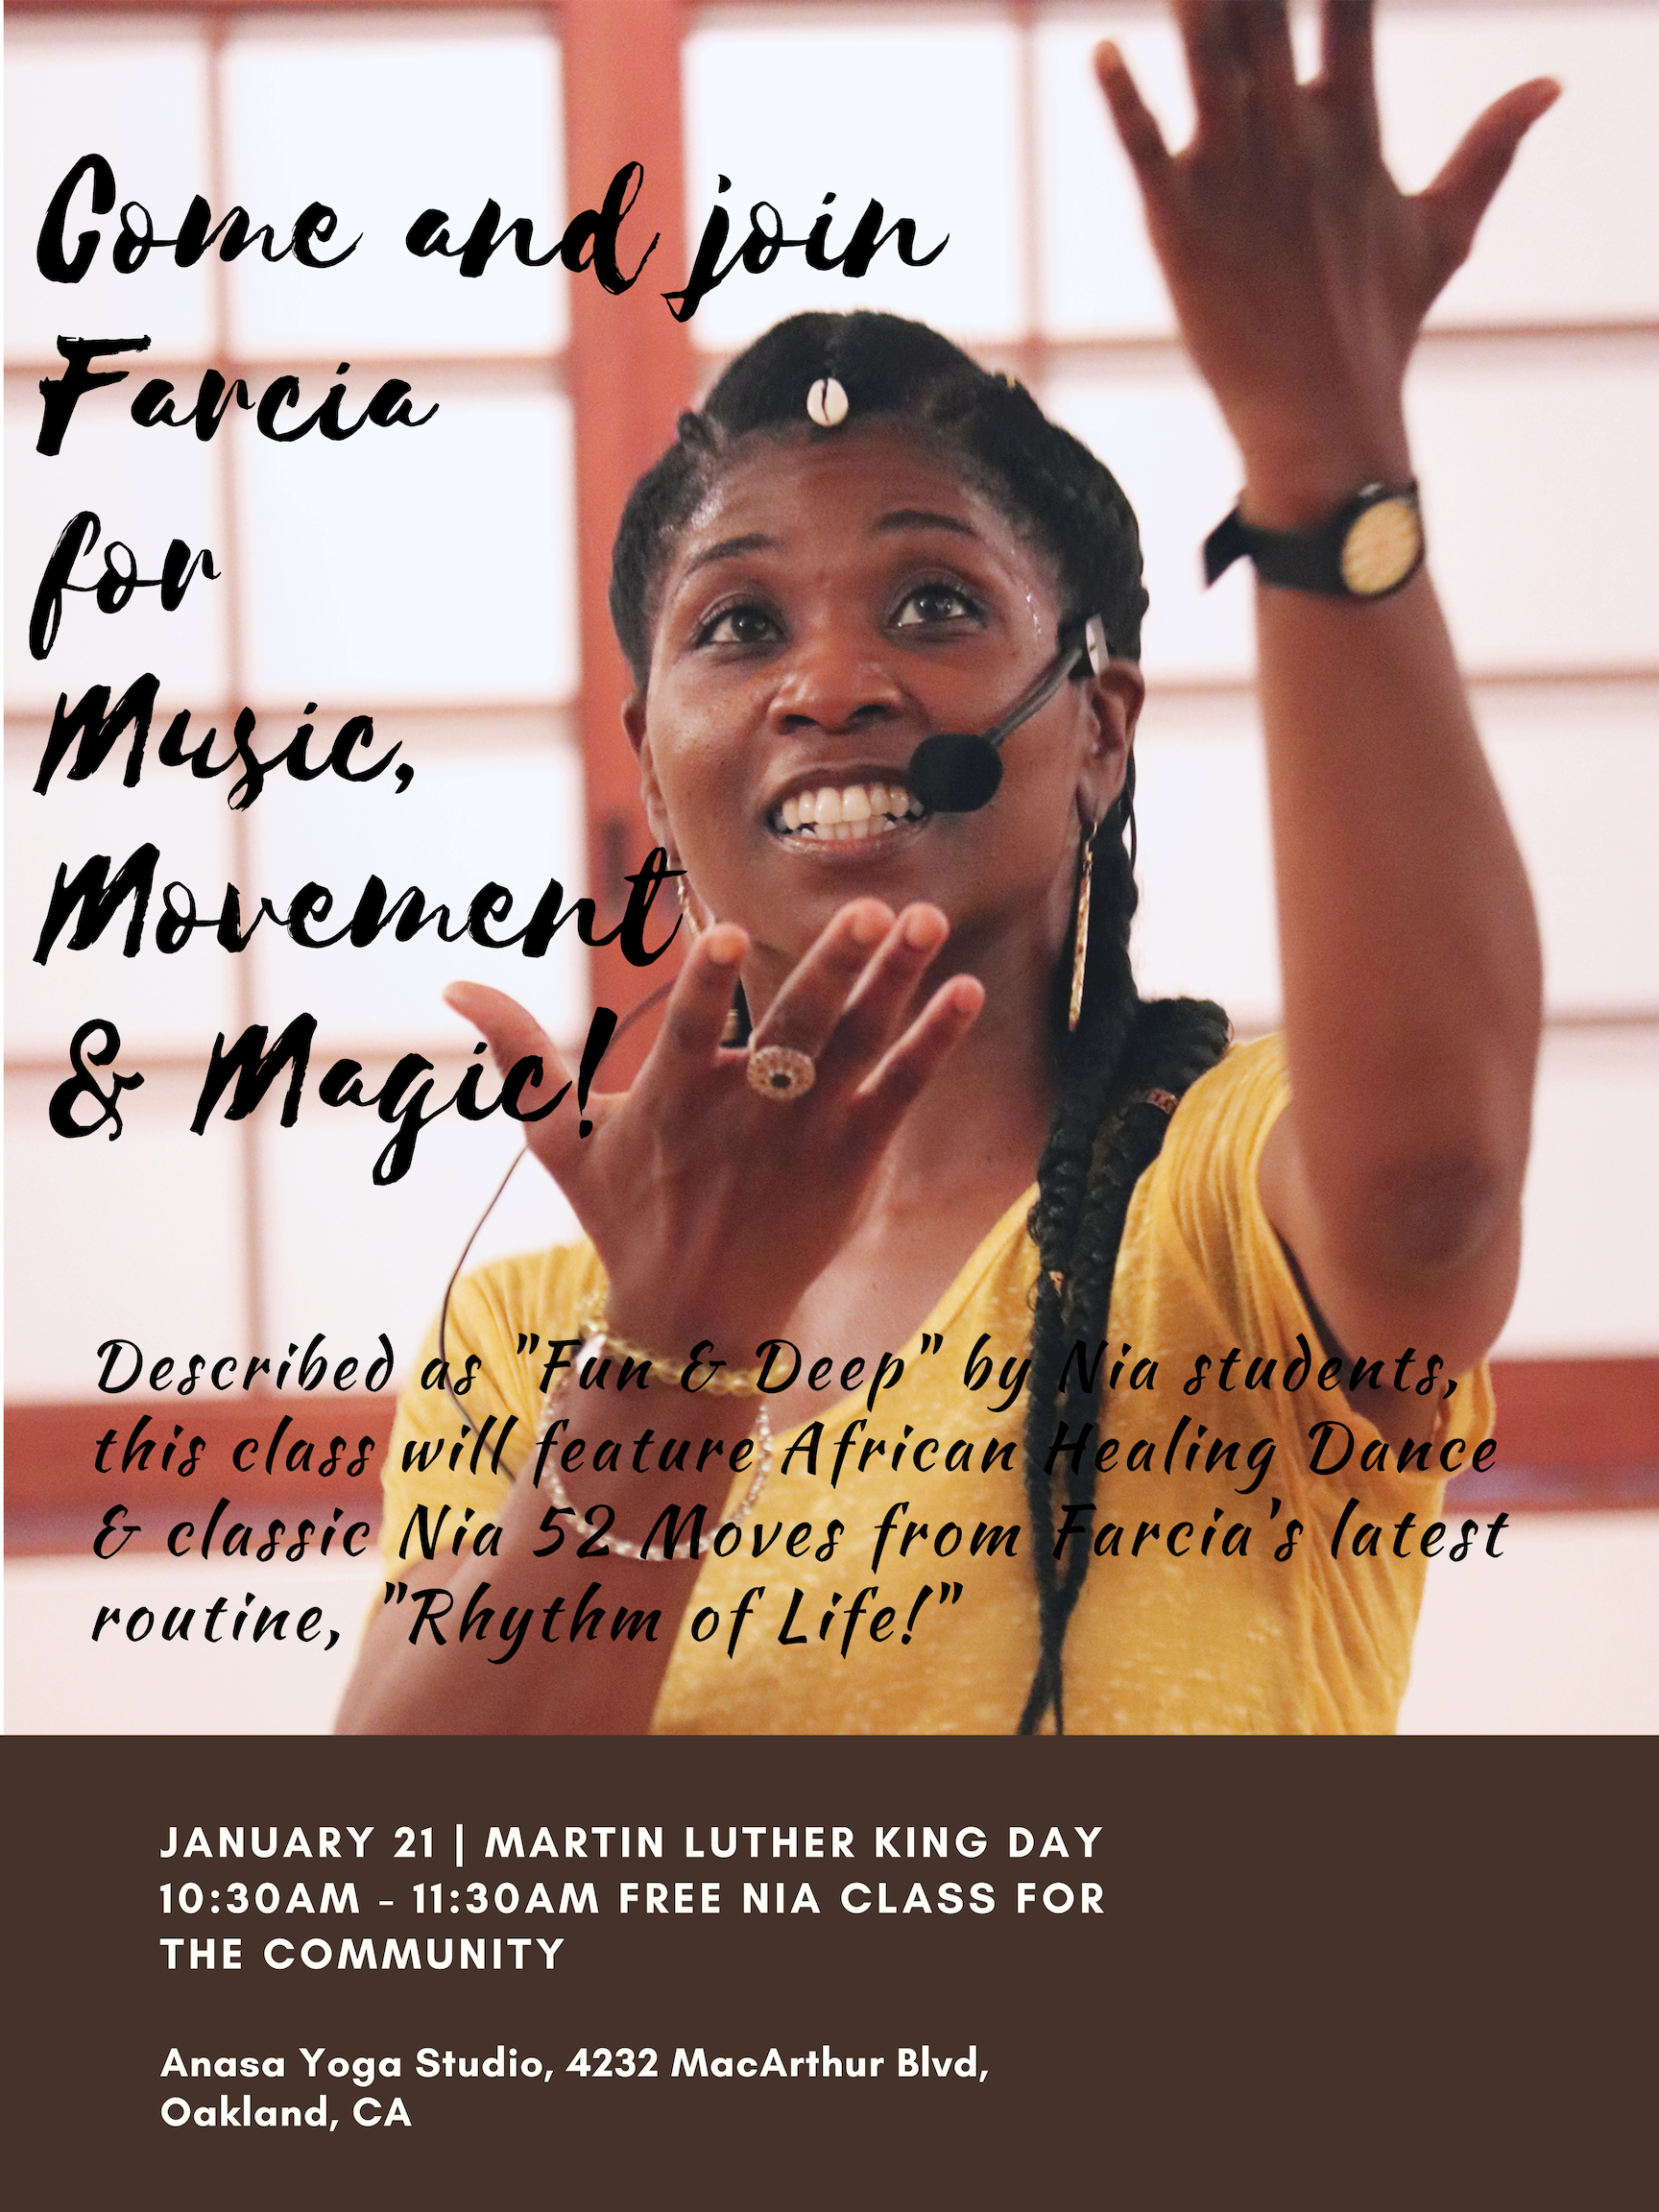 Farcia's MLK Jr. Day - Nia Class